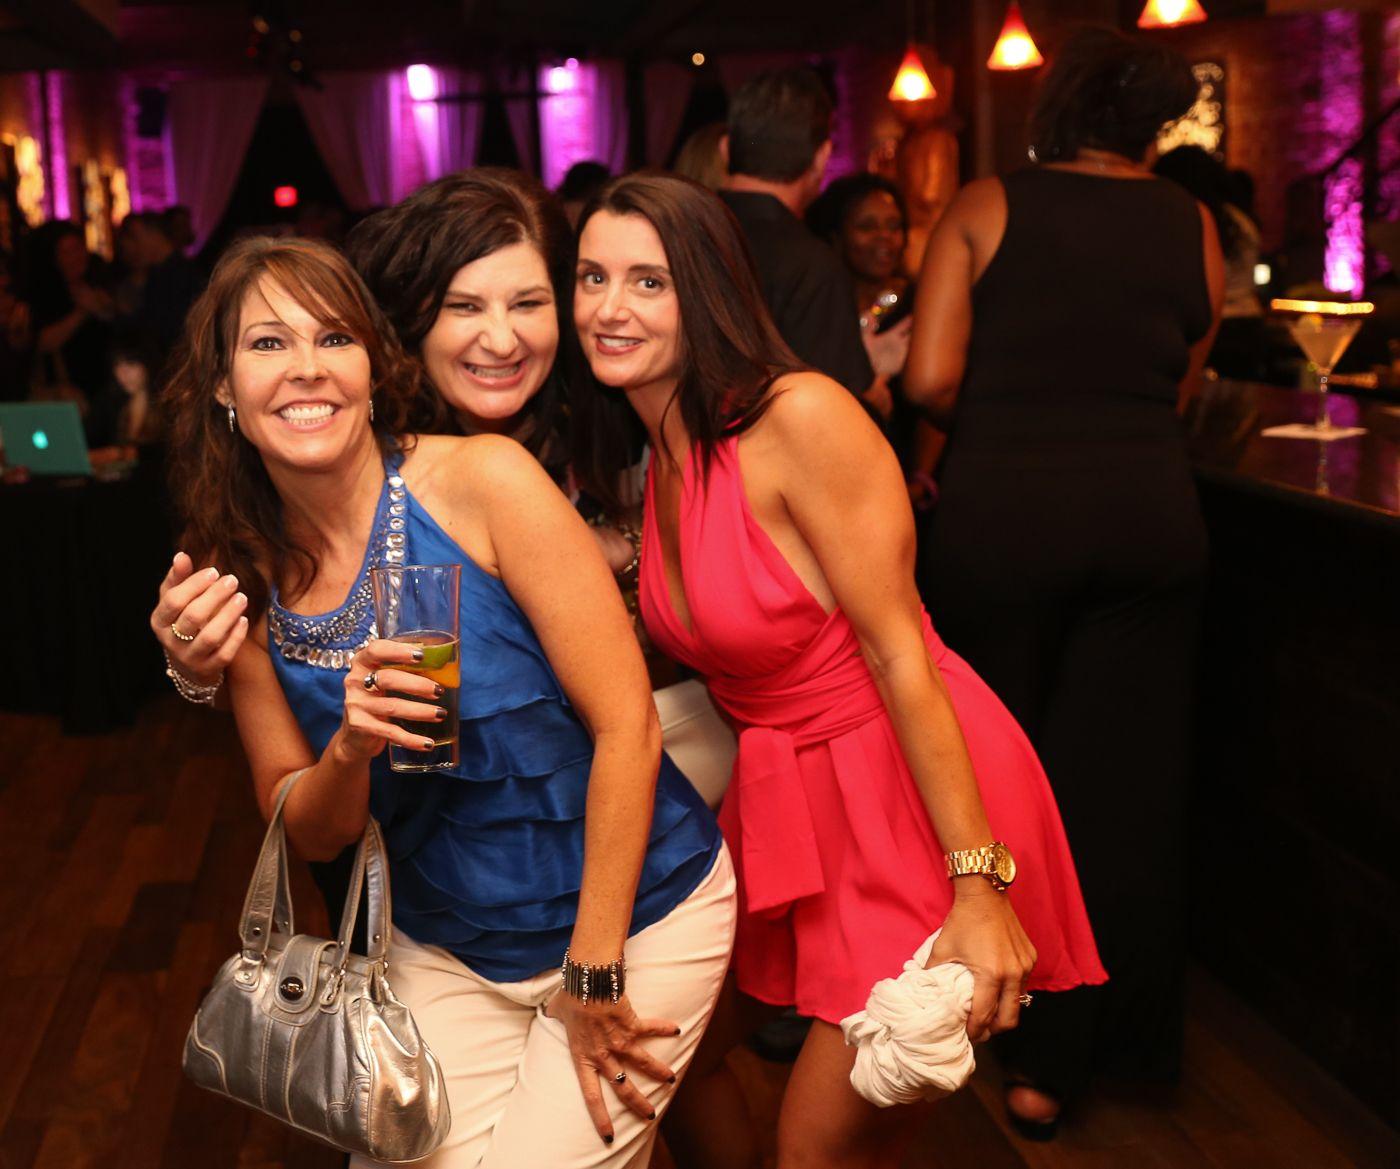 2015 07-24 Boca-Ciega-High-School-30th-Reunion-at-venue-NOVA-535-downtown-StPete-113